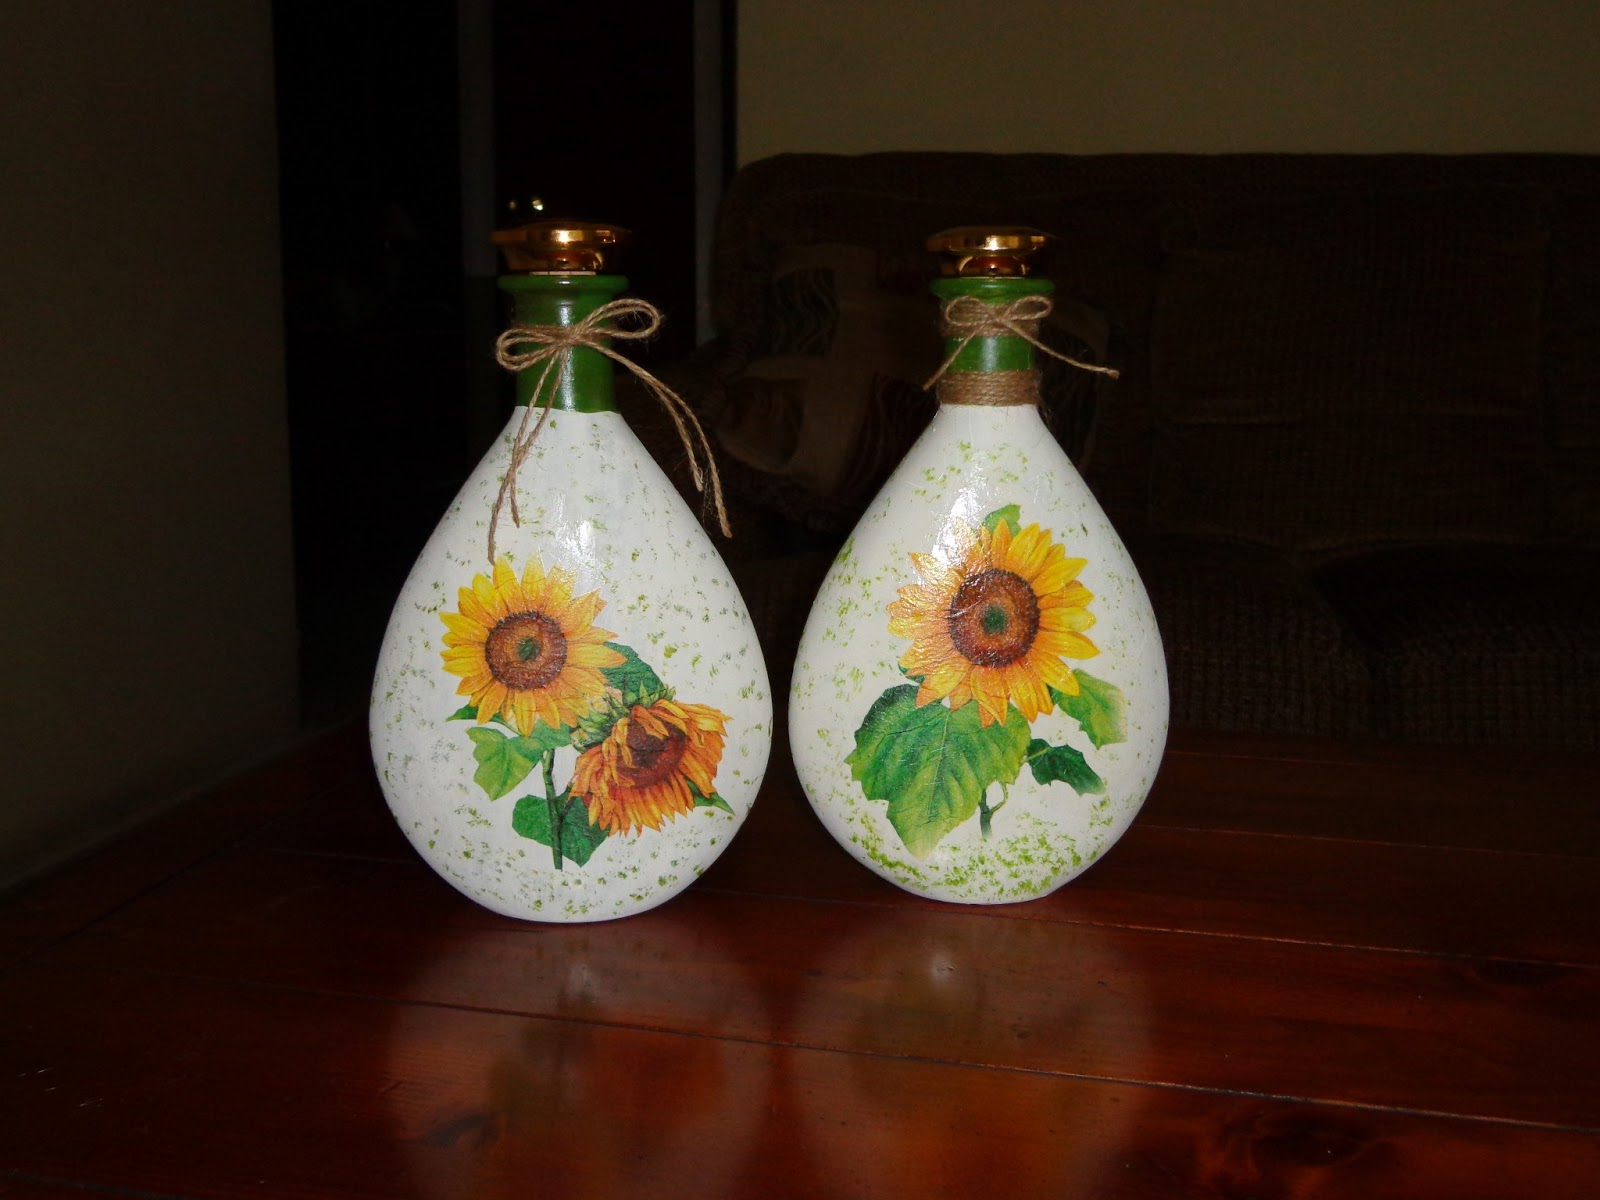 Manualidades con botellas de vidrio imagui - Botellas decoradas manualidades ...